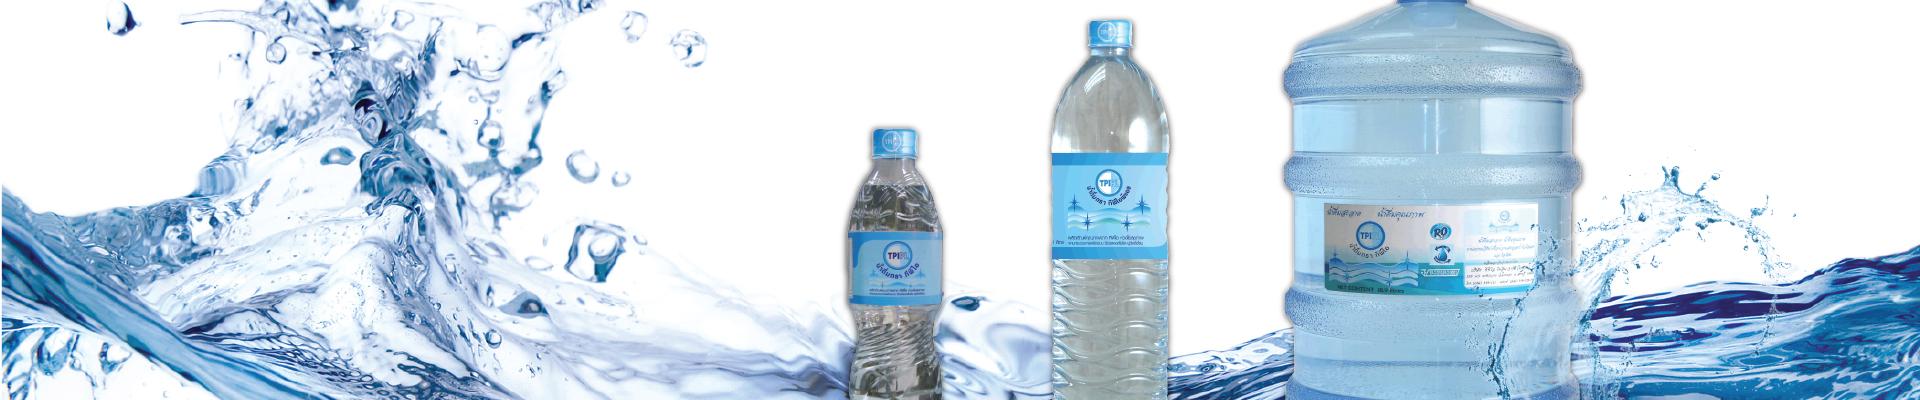 Banner_Drinking_water